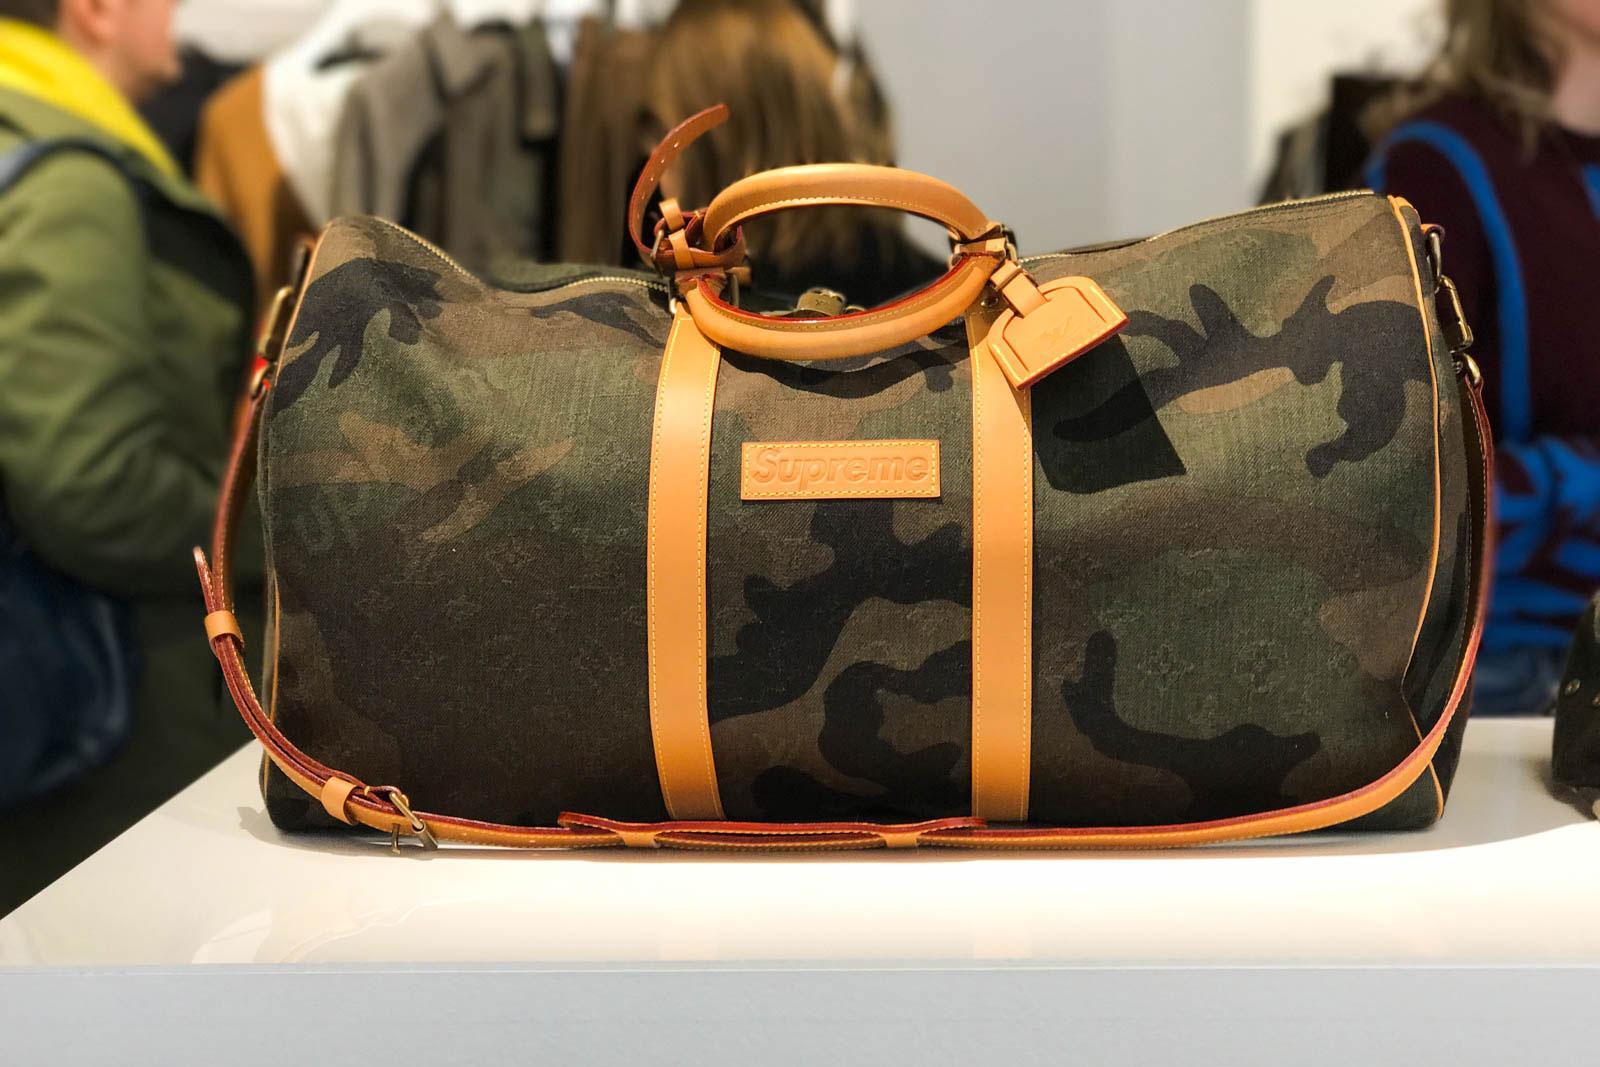 Supreme x Louis Vuitton 2017 Fall/Winter Closer Look Showroom - 3703531